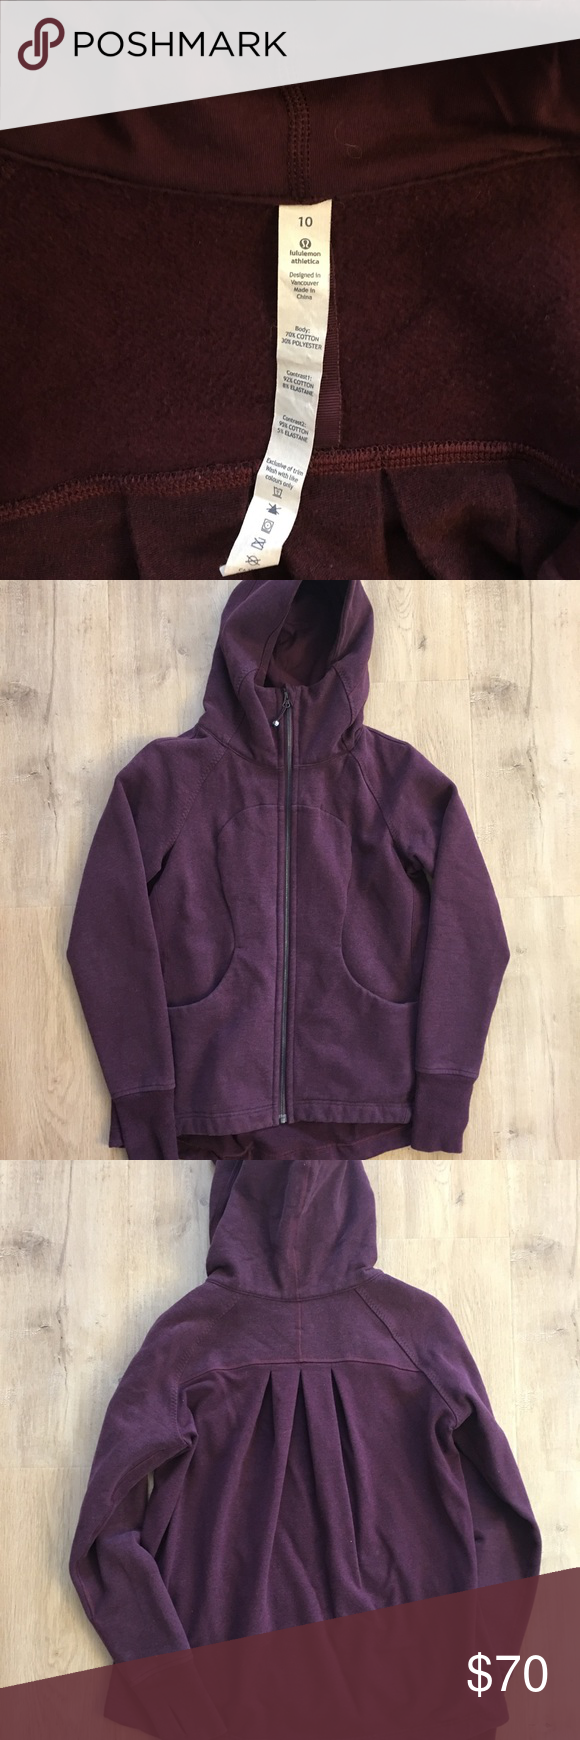 Lululemon burgundy hooded sweater | Hooded sweater, Lululemon and ...